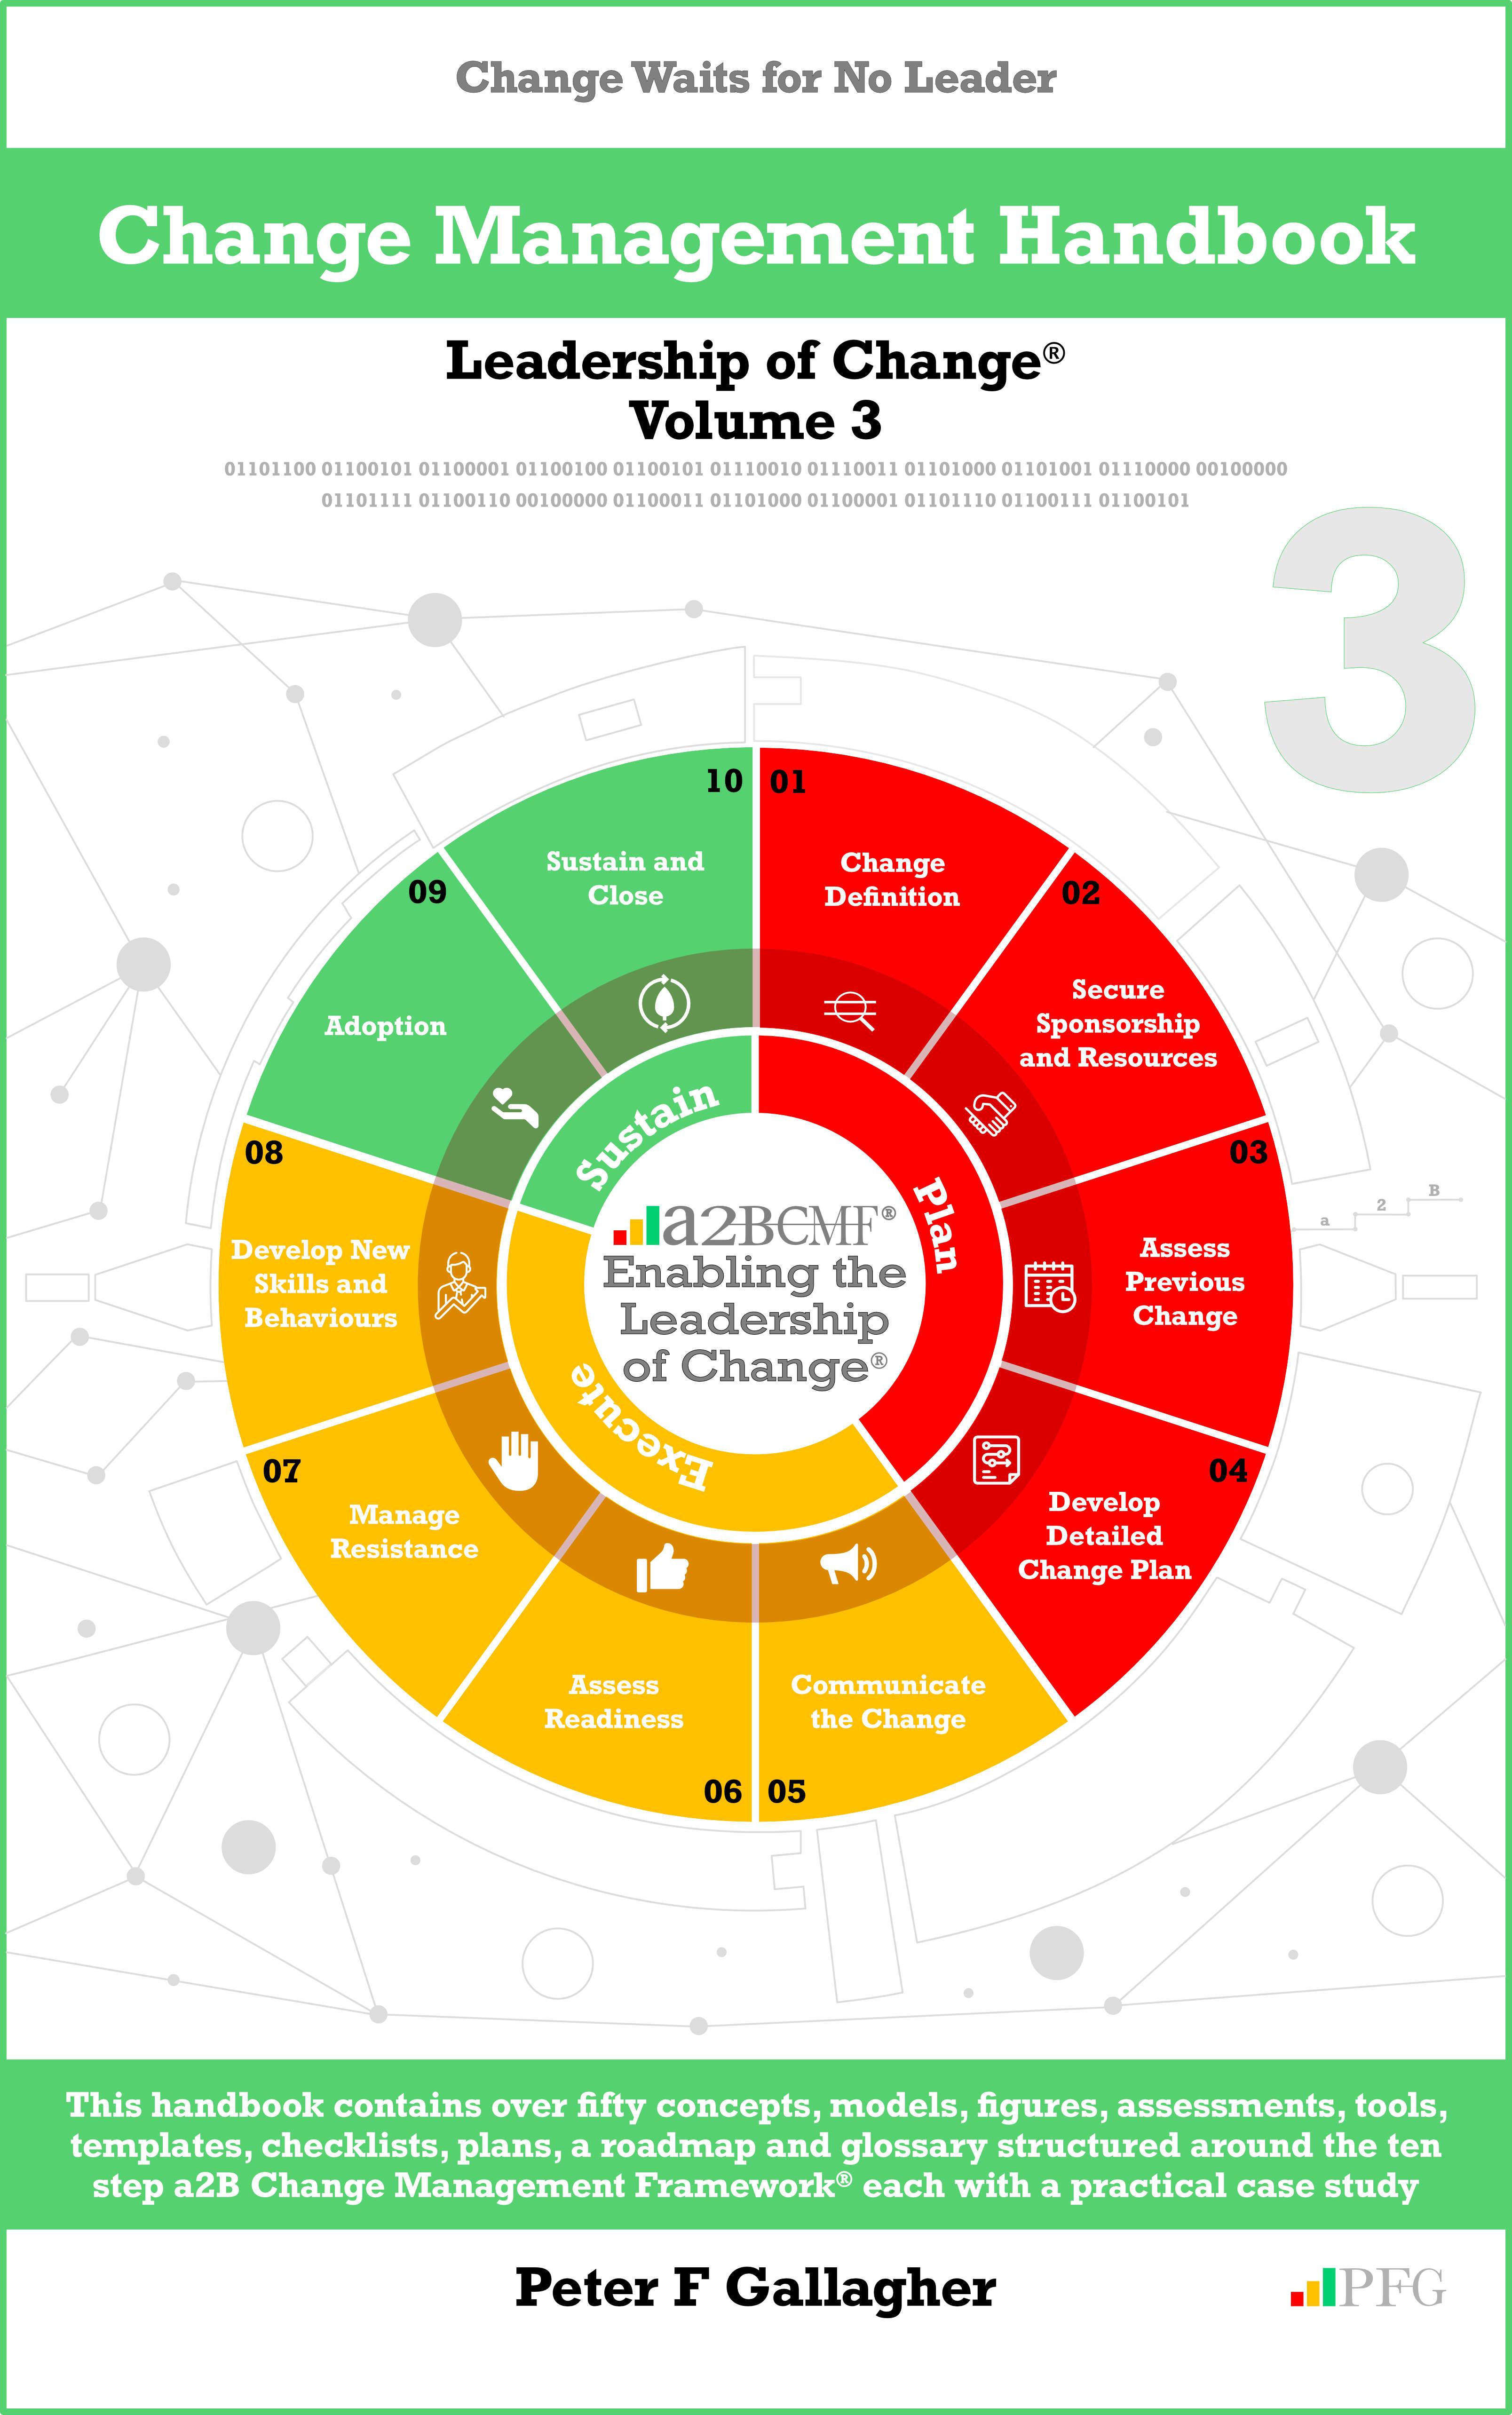 Change Management Handbook - Leadership of Change Volume 3 – Peter F Gallagher, Change Management Ha